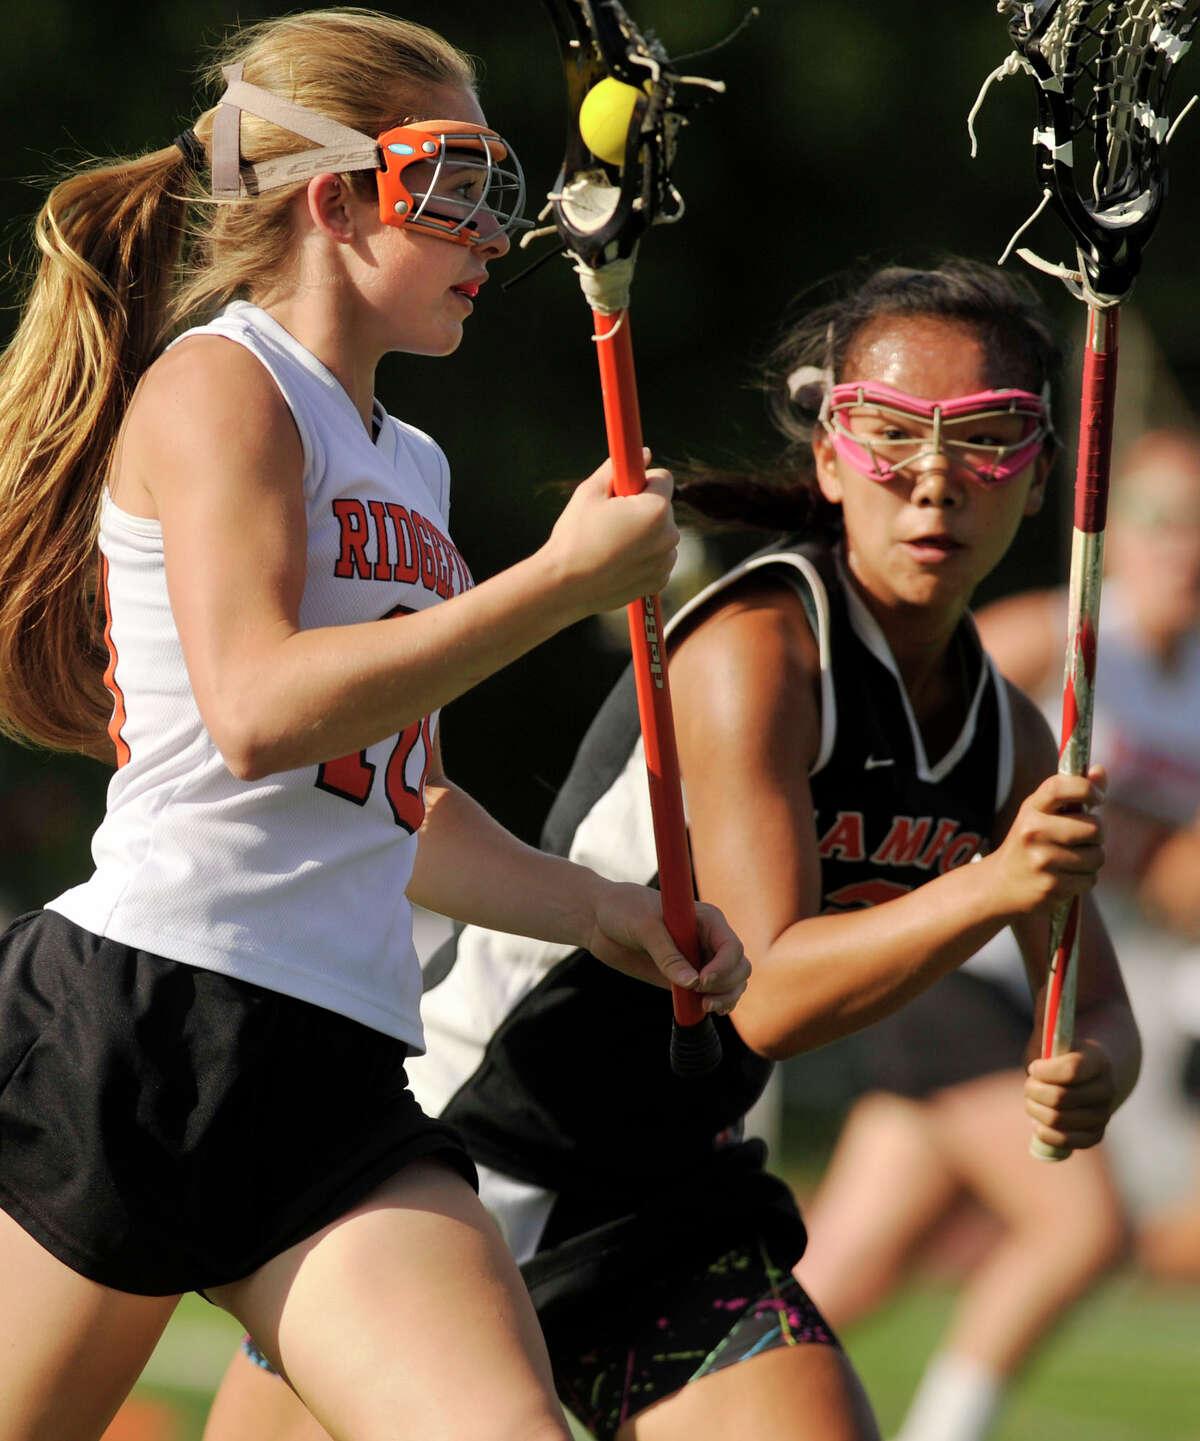 Ridgefield's Megan Kirchoff runs into resistance from Stamford's Jasmine Li during their Class L state tournament game at Ridgefield on Thursday, May 31, 2012. Ridgefield won 16-9.